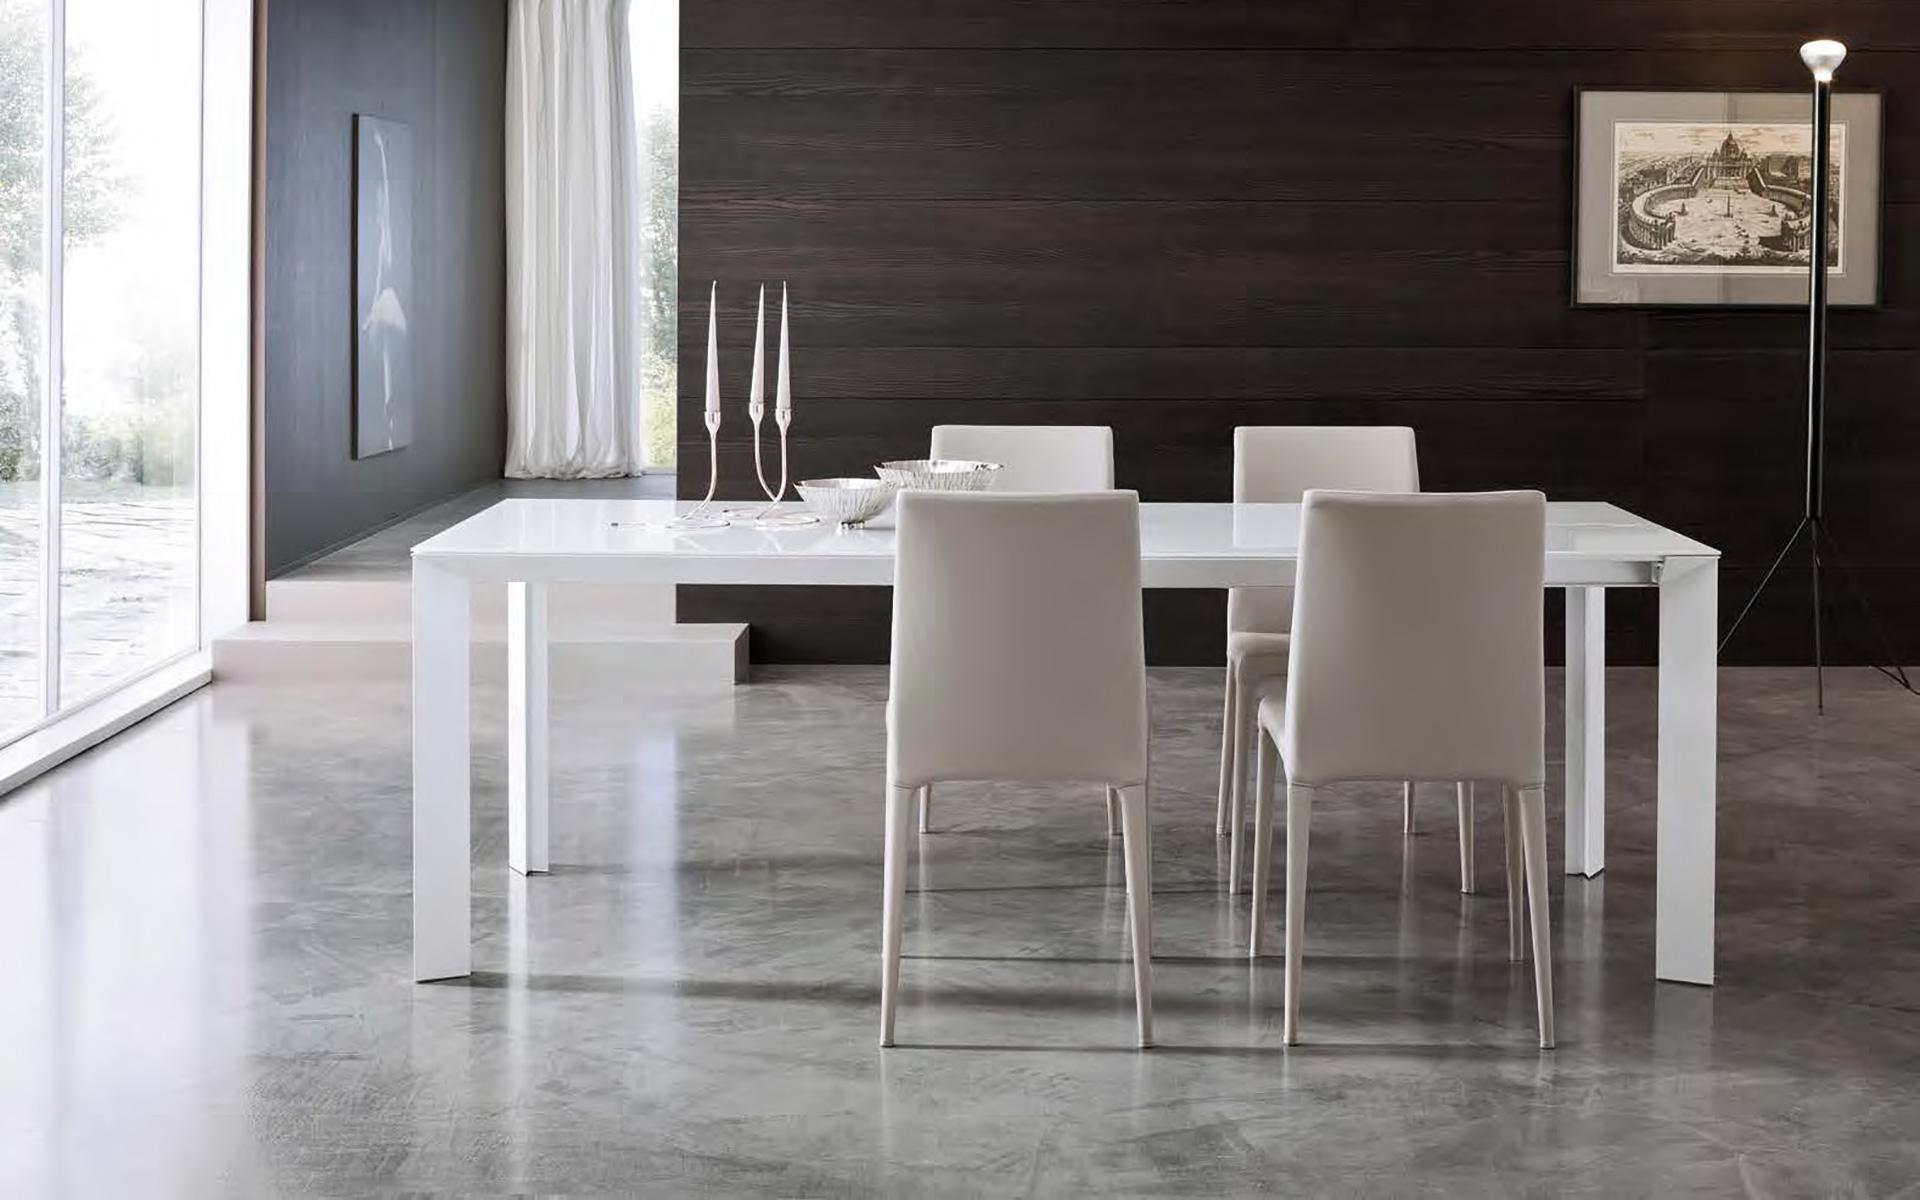 Tavoli e sedie horizon mobilgam for Riflessi tavoli e sedie